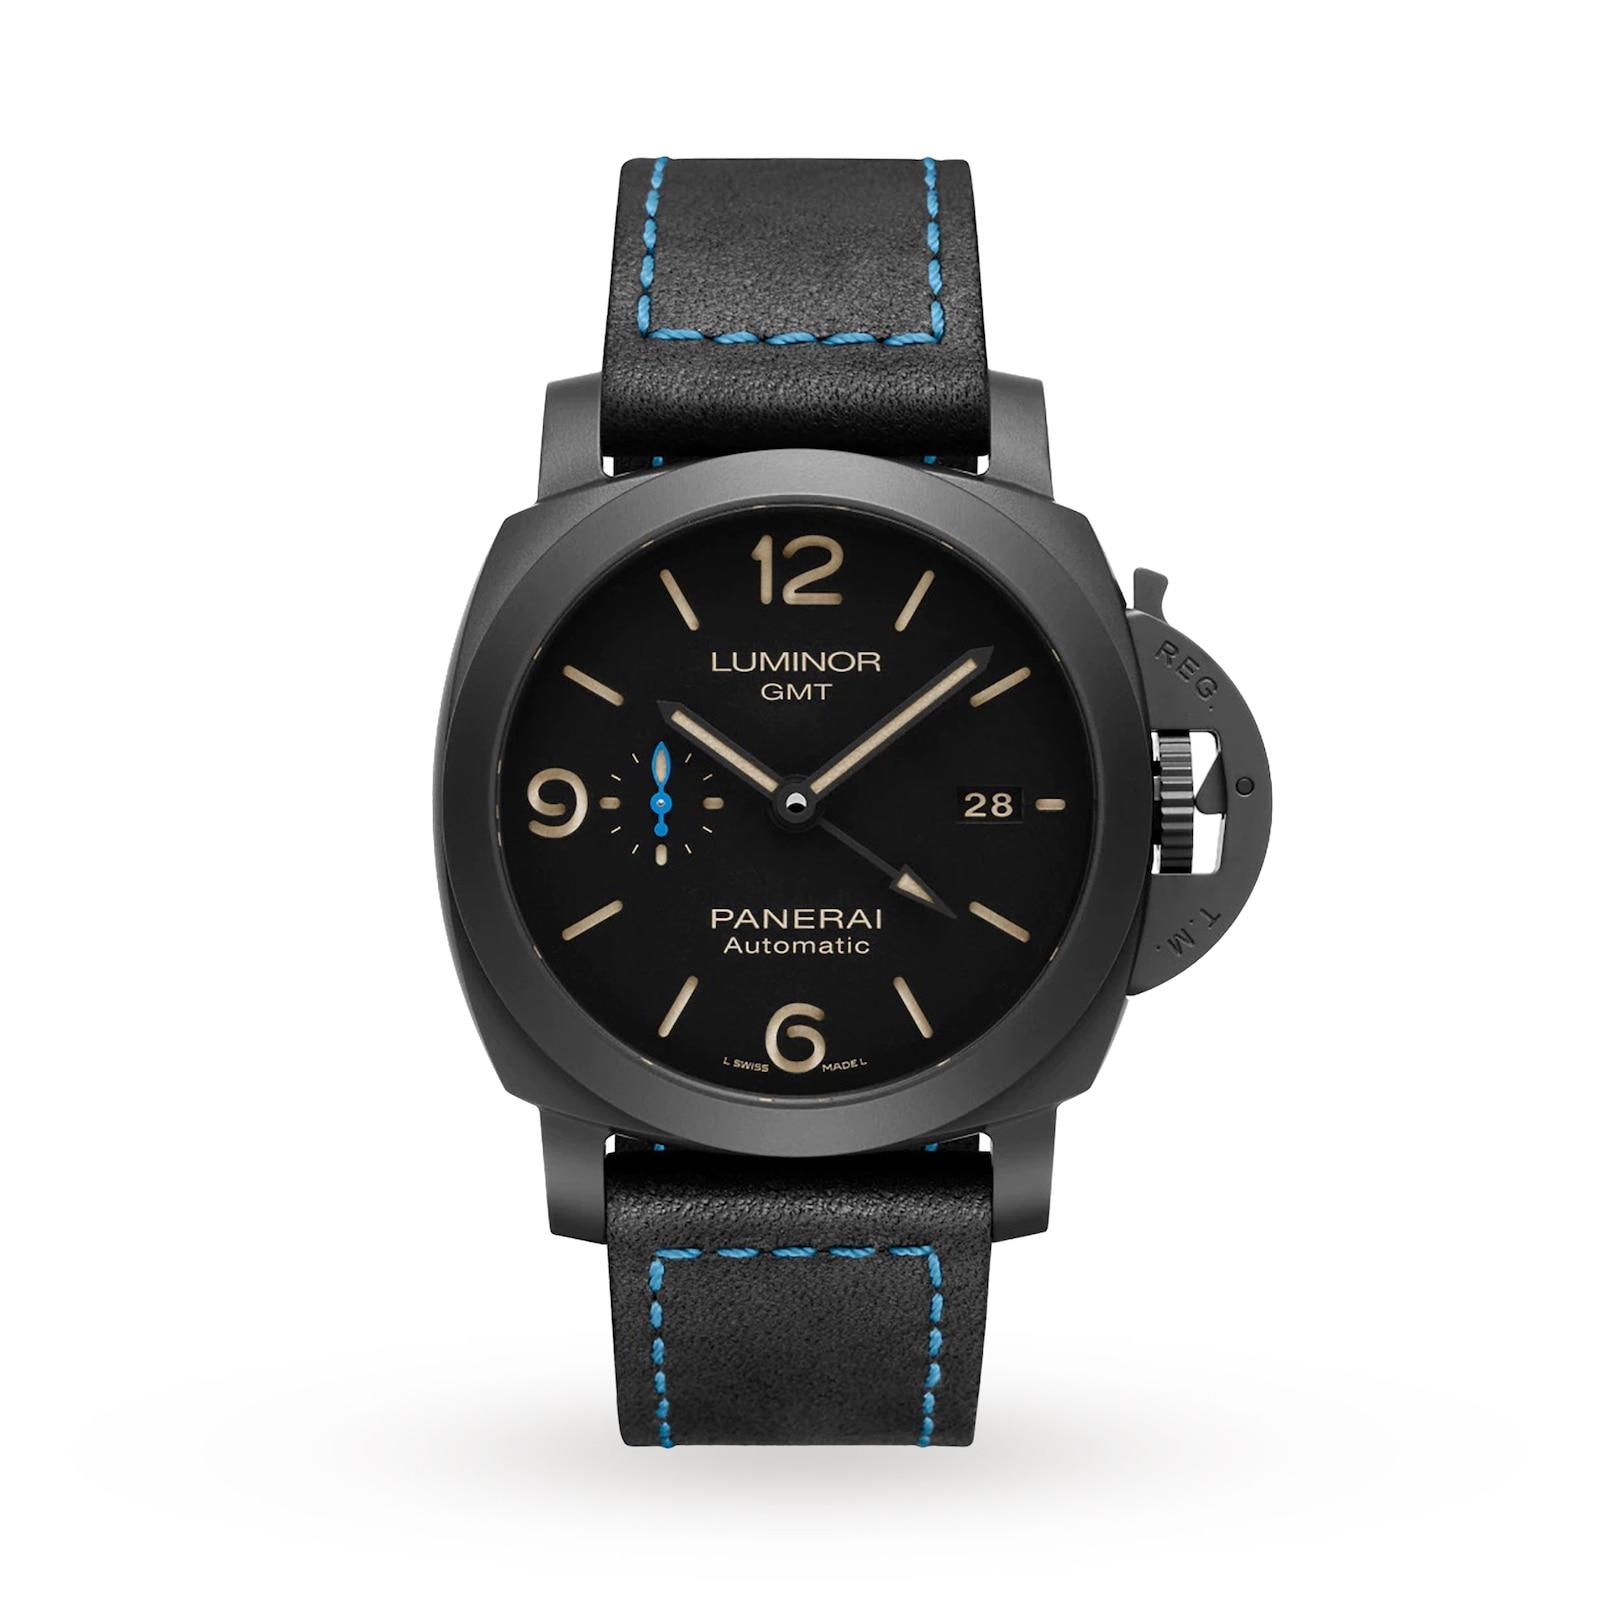 Panerai Luminor Due 3 Days GMT Automatic Ceramica 44mm Watch Mens Watches